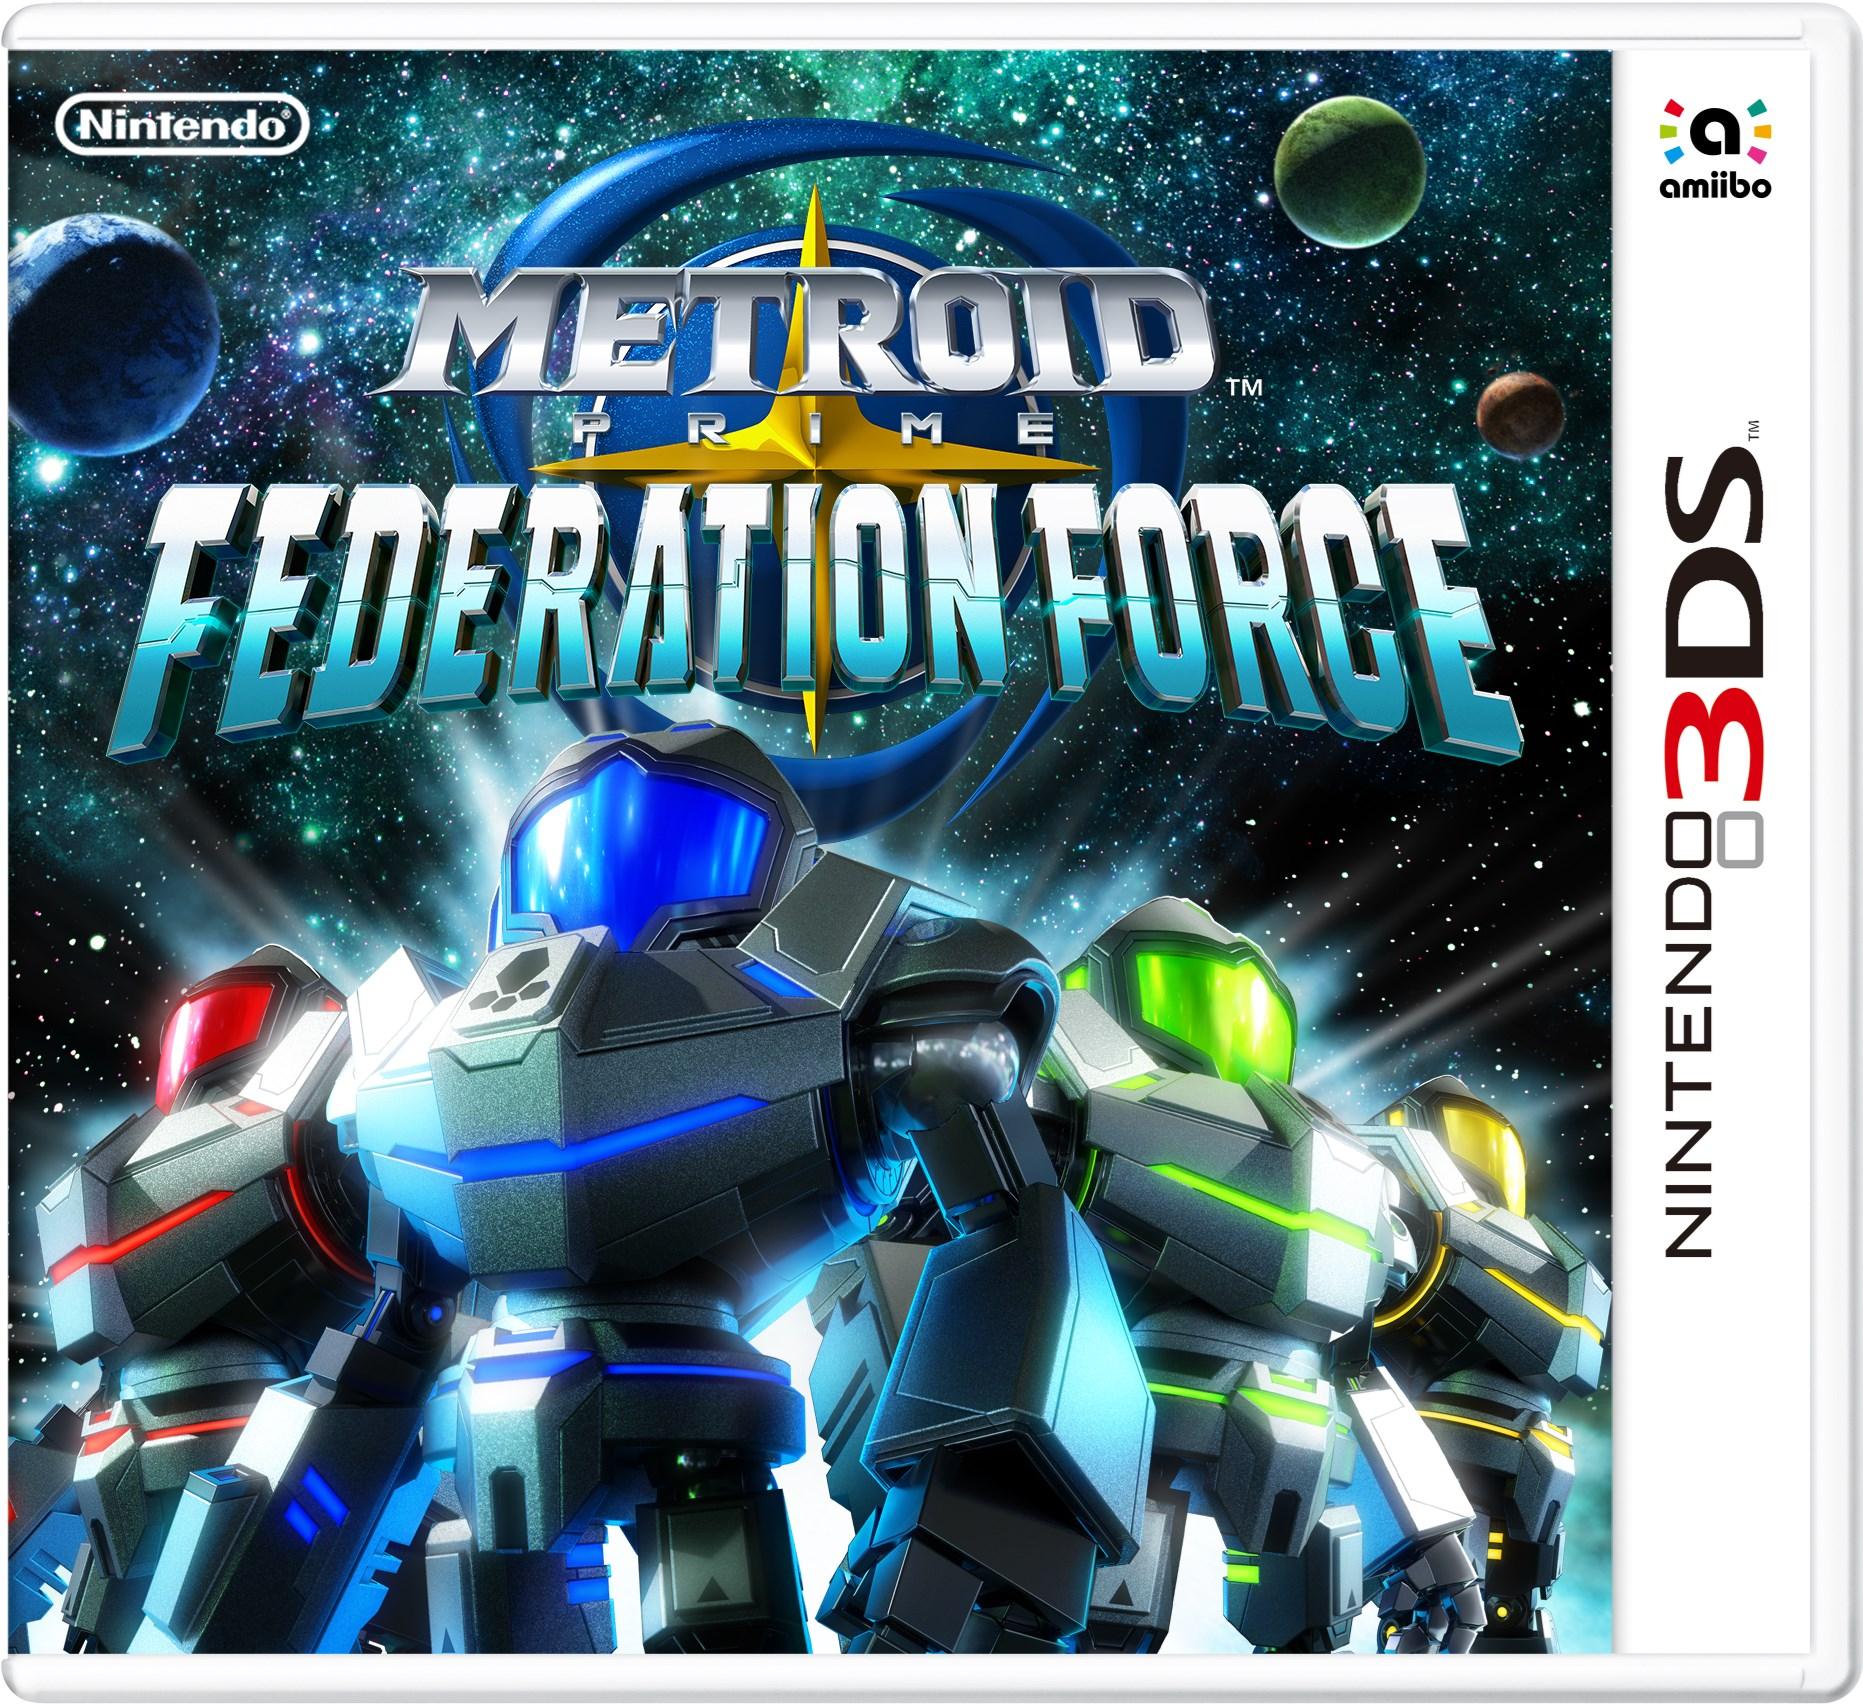 N3DS_MetroidPrimeFF_boxart_01_png_jpgcopy